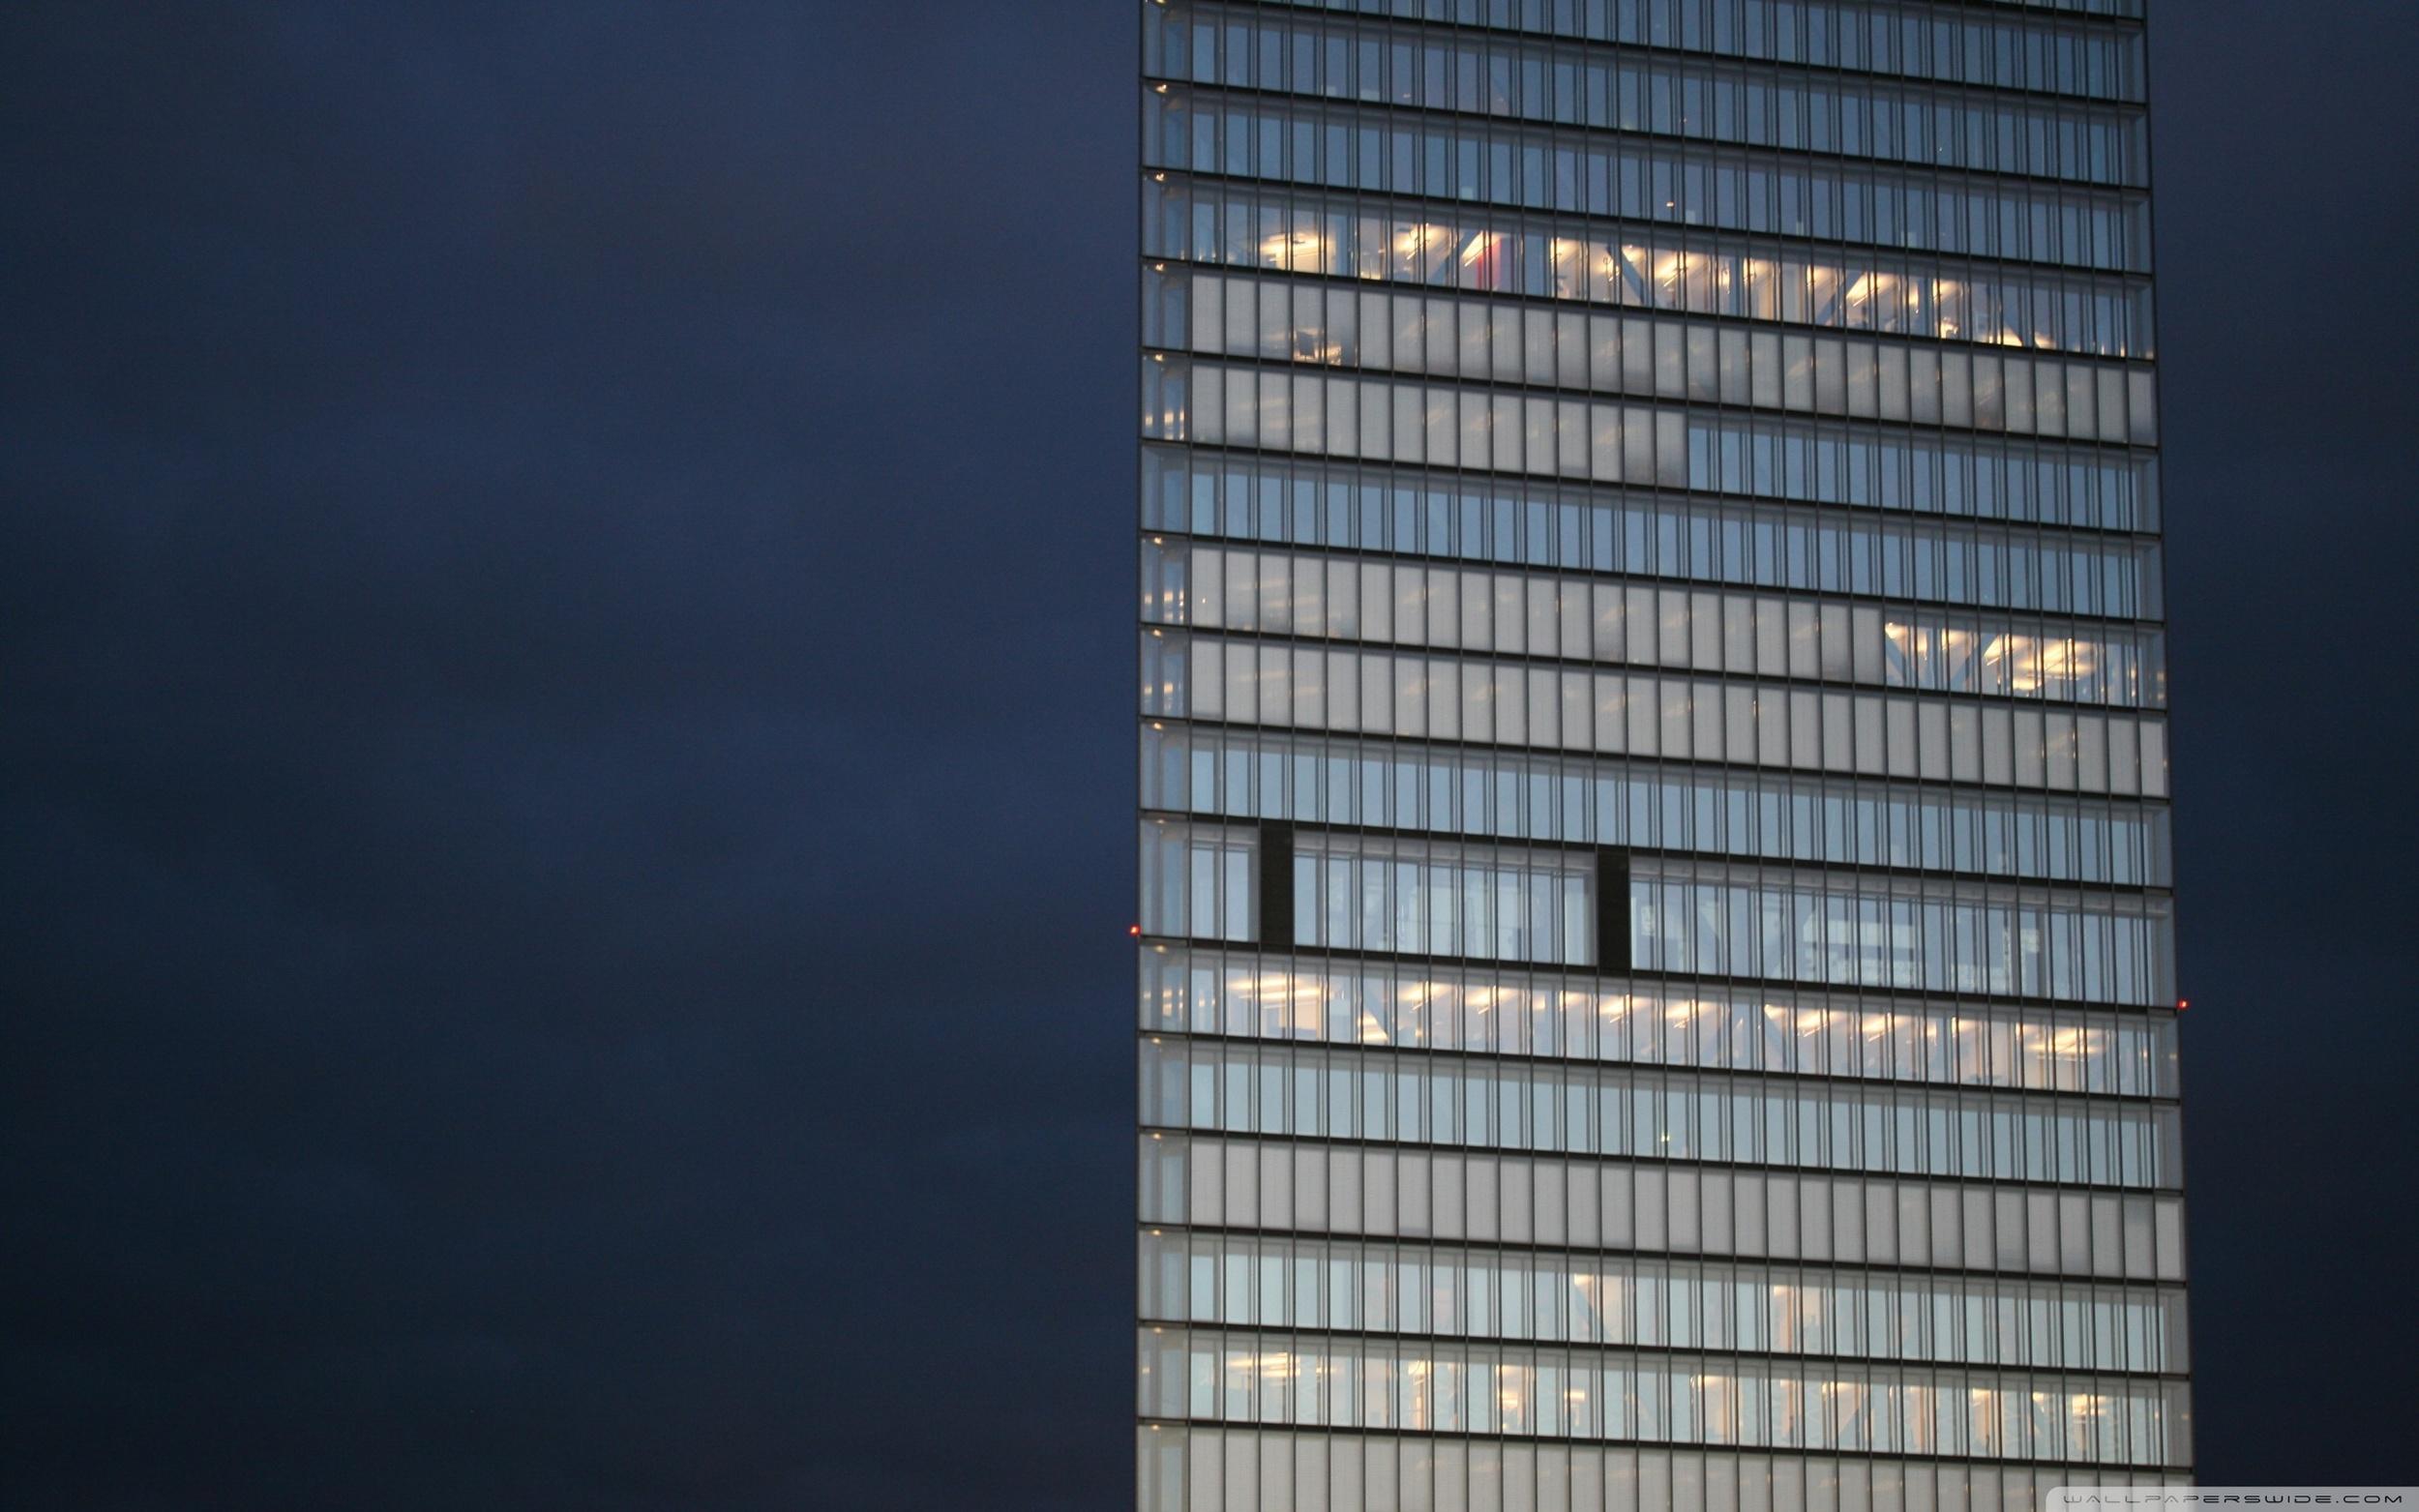 skyscraper_3-wallpaper-2560x1600.jpg